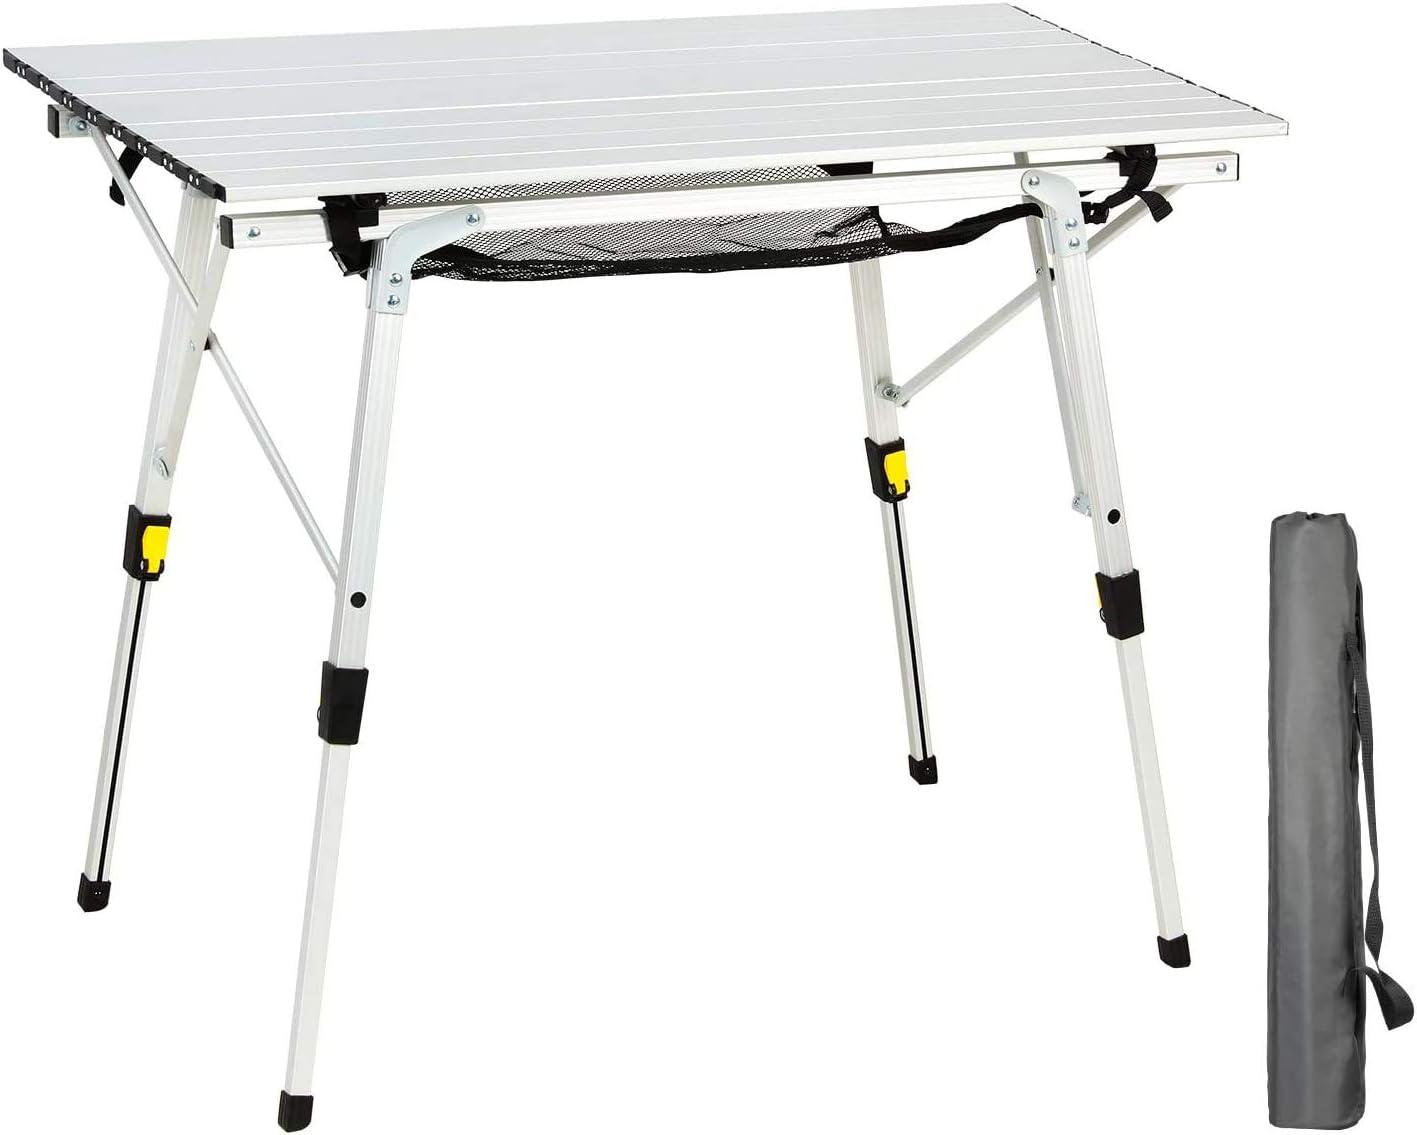 Ever Advanced Mesa Plegable de Aluminio Ligero para 4 Personas Altura de la Pierna Ajustable Mesa Compacta con Bolsa de Transporte para Camping Picnic ...